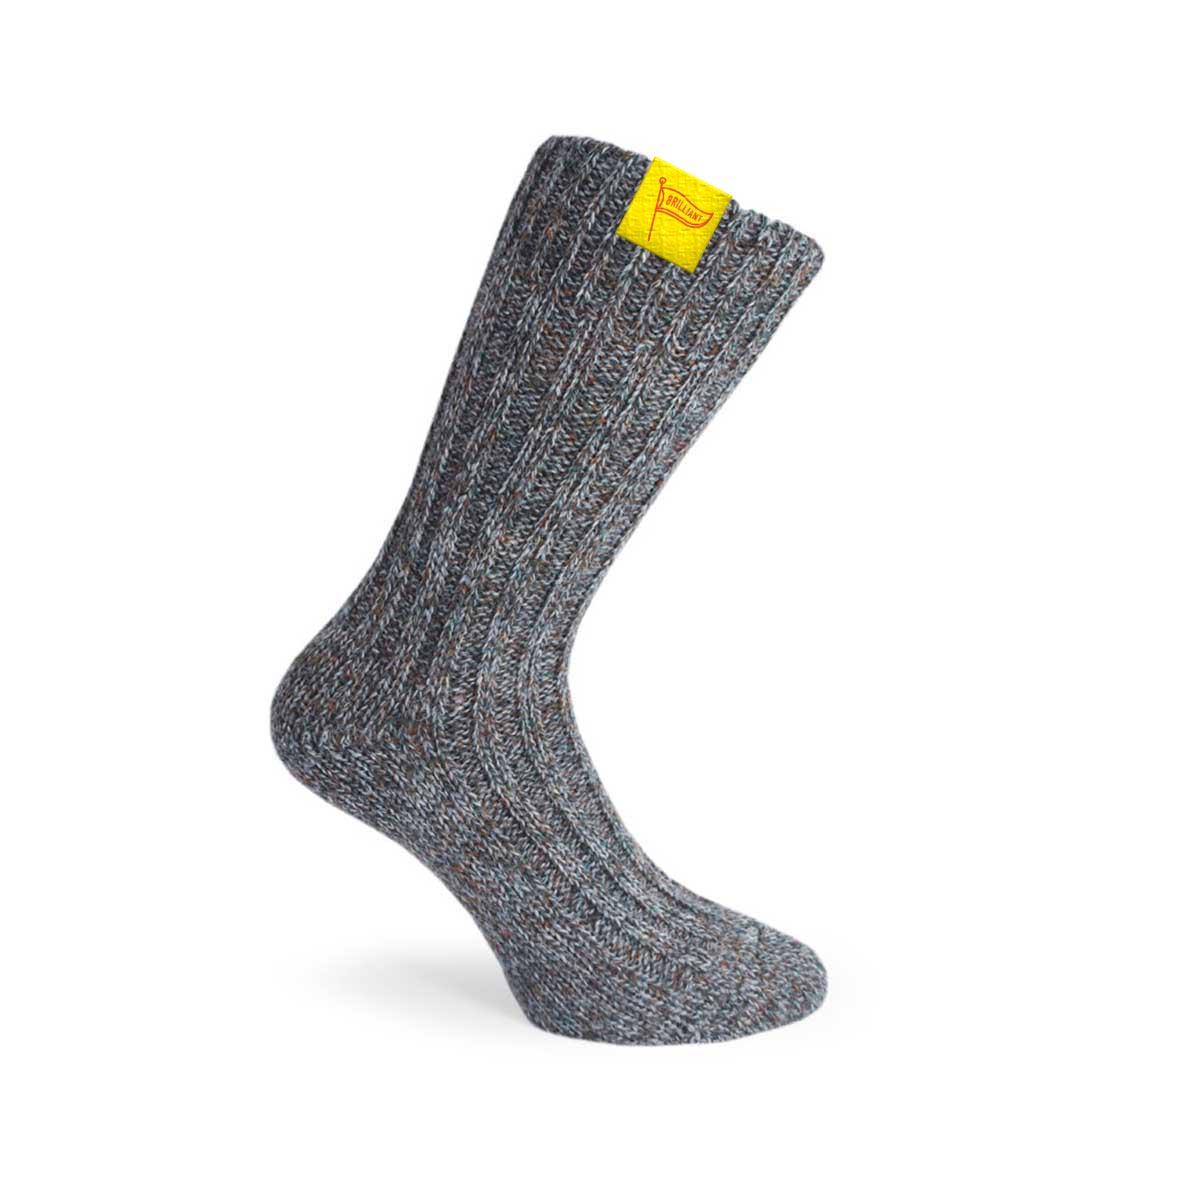 229567 woven wool socks full color woven hem tag